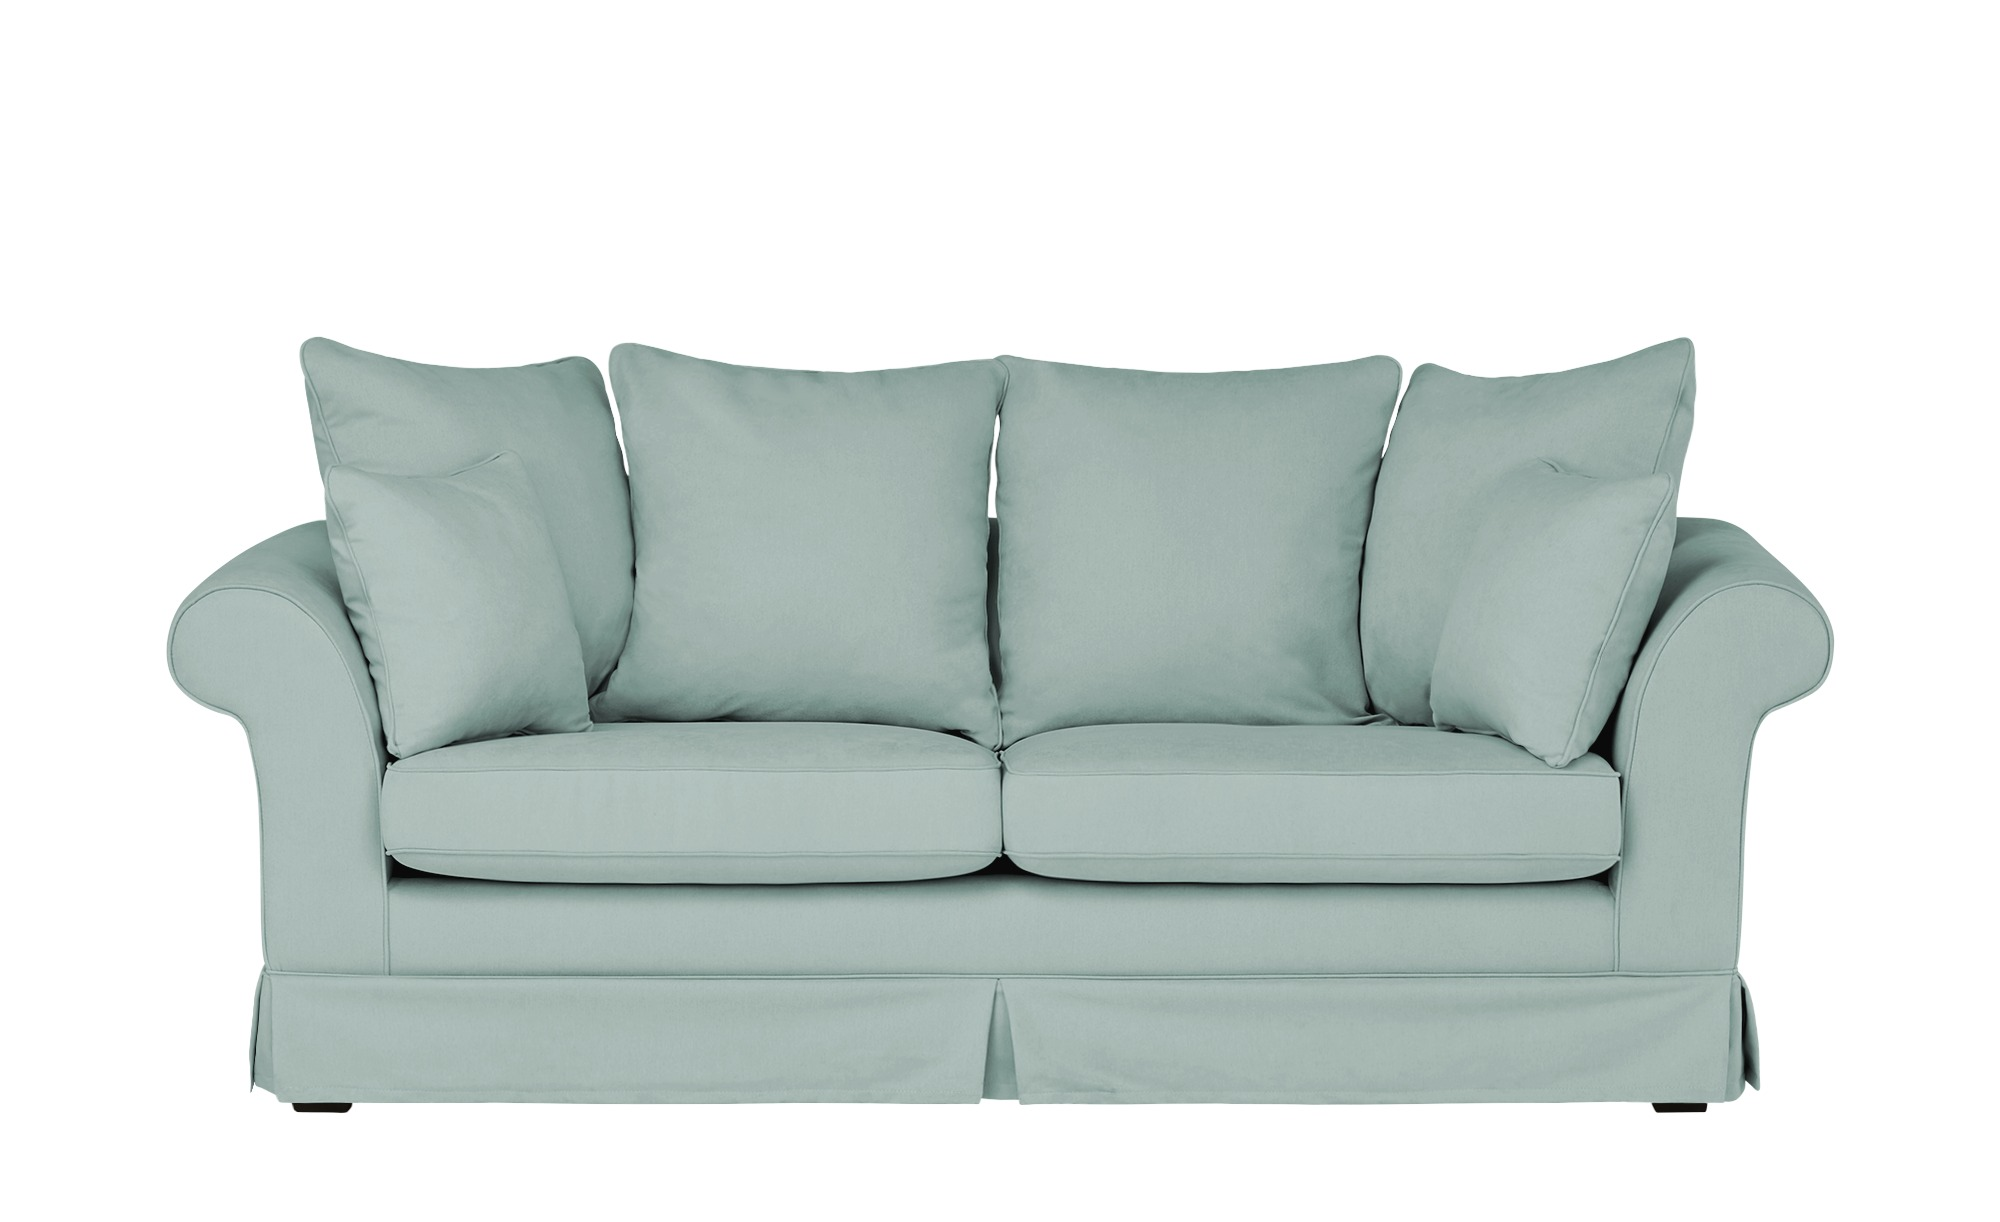 Hussensofa, 3-sitzig  Hampton ¦ blau ¦ Maße (cm): B: 214 H: 70 T: 92 Polstermöbel > Sofas > 3-Sitzer - Höffner